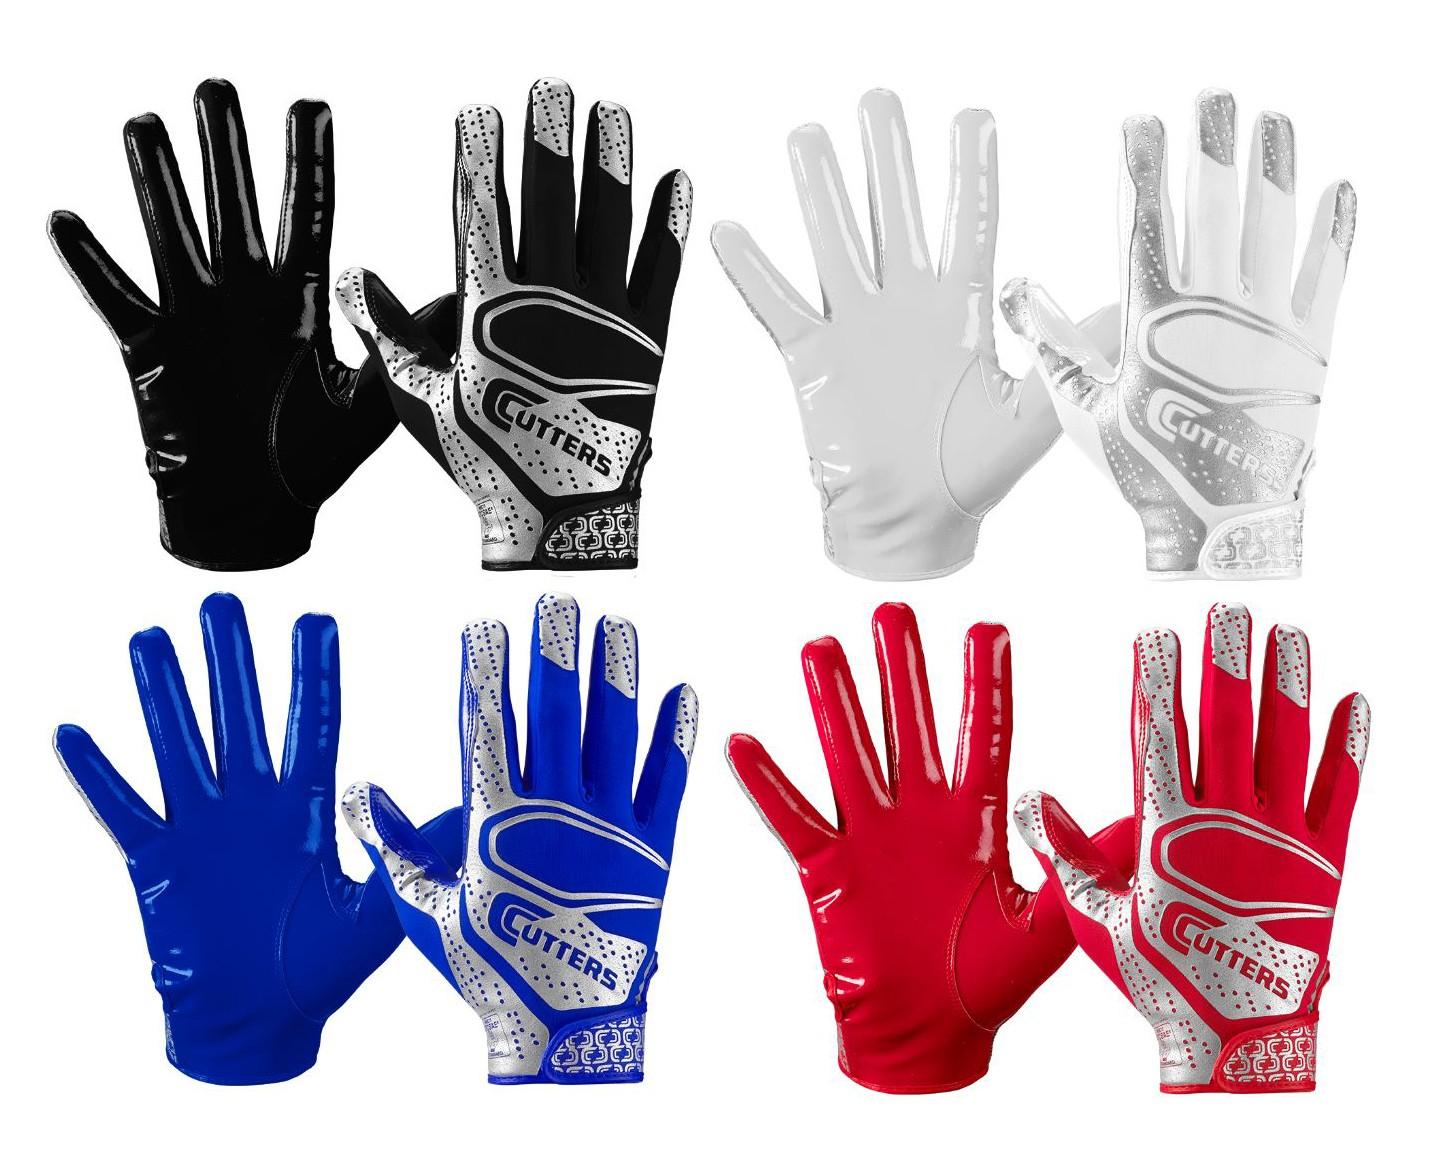 Gloves & Grip Enhancer